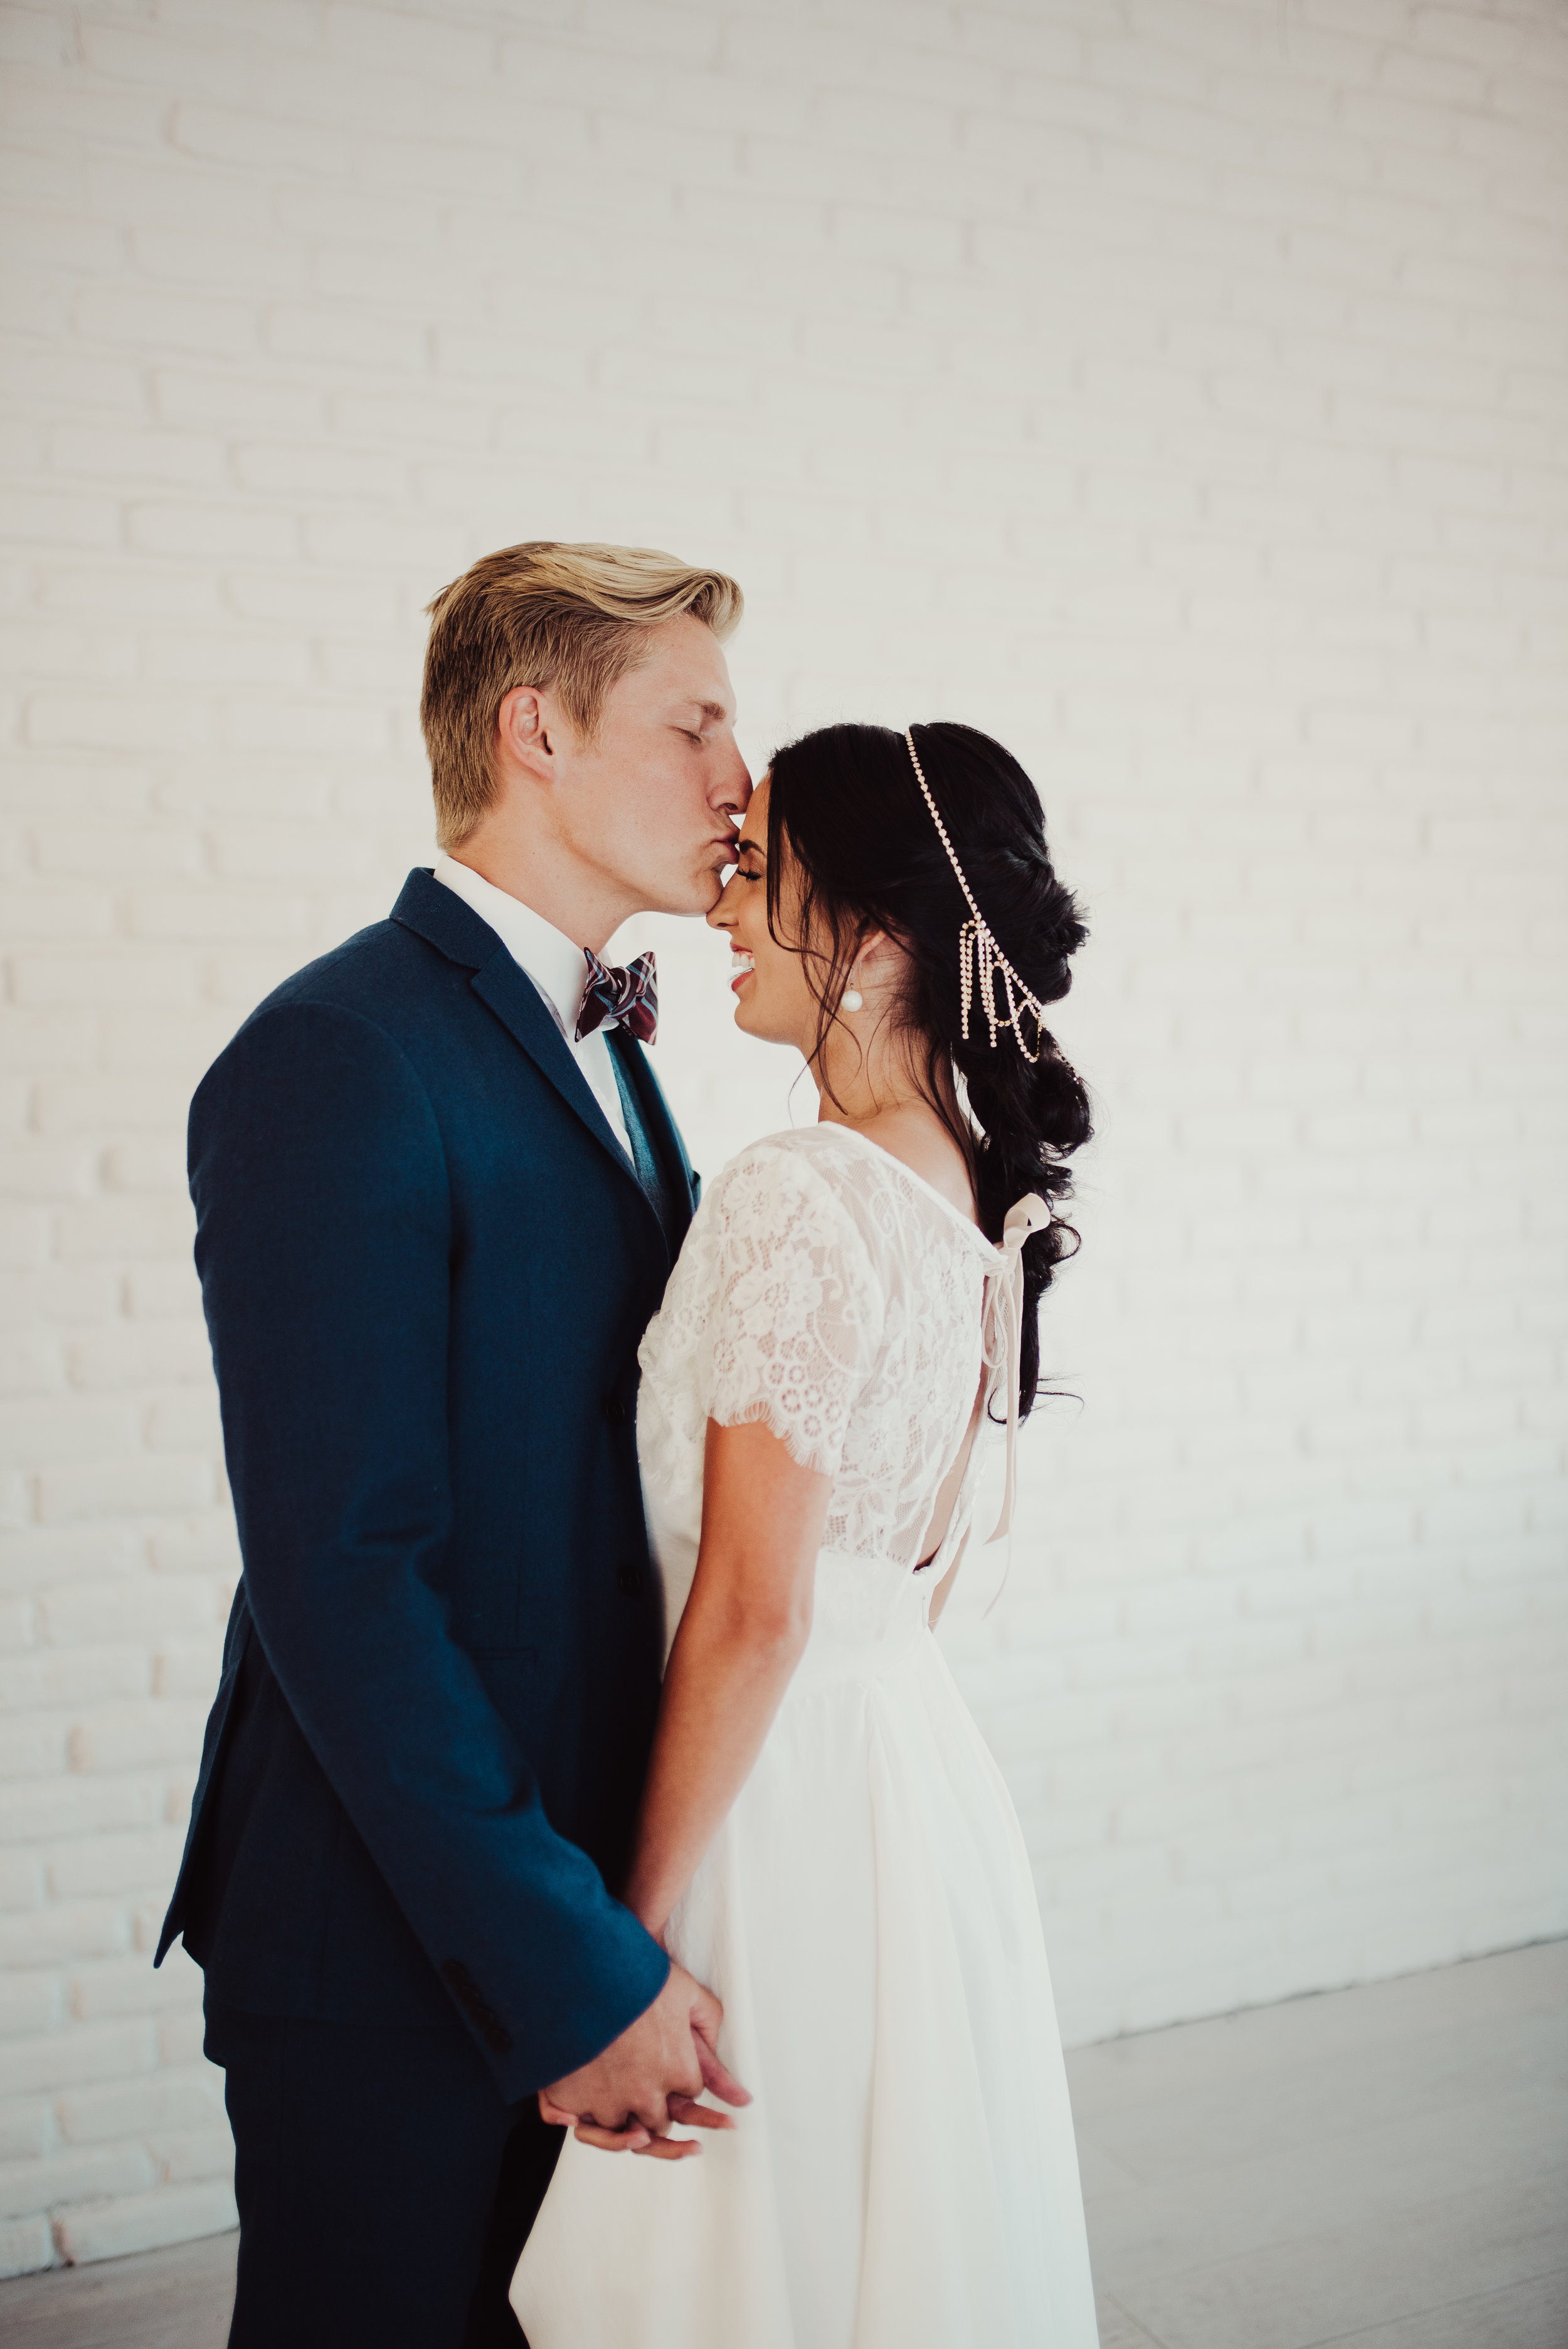 boho-bride-forhead-kiss.jpg